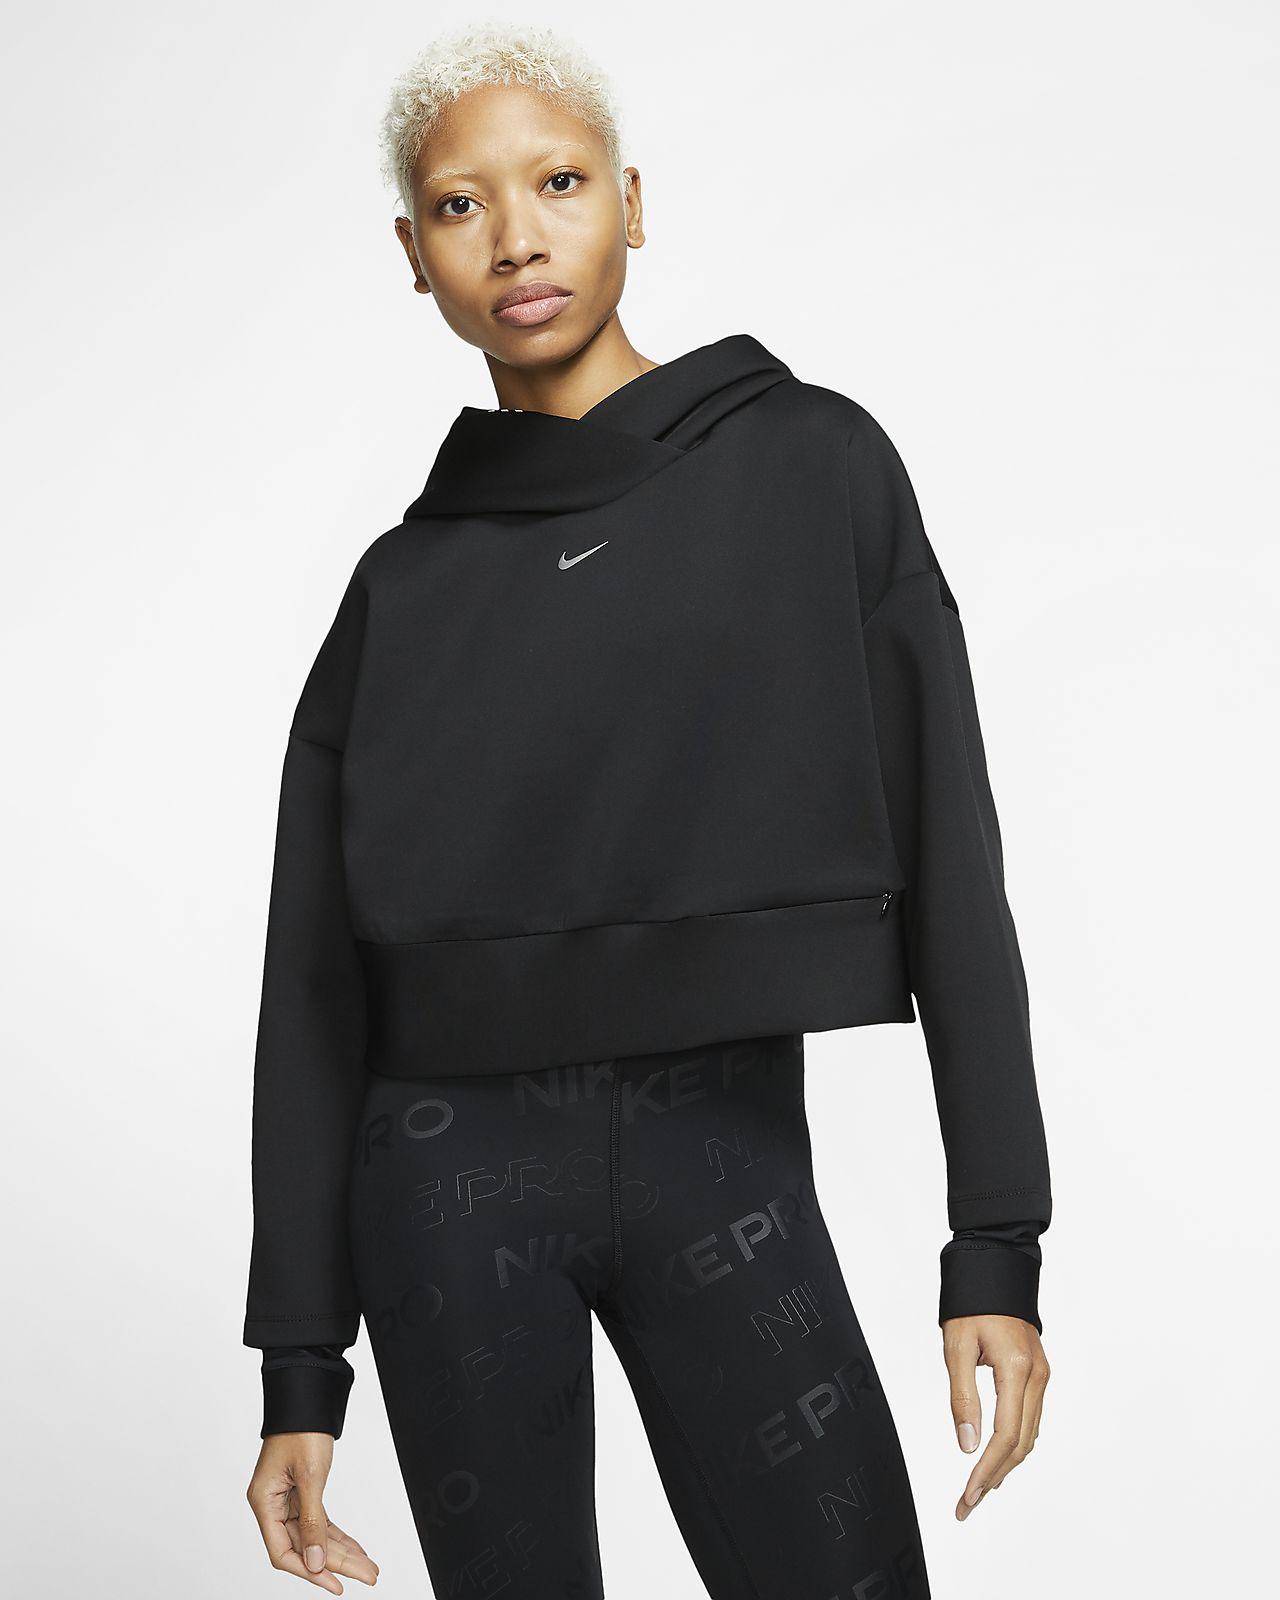 Nike Pro belebújós polár kapucnis női pulóver